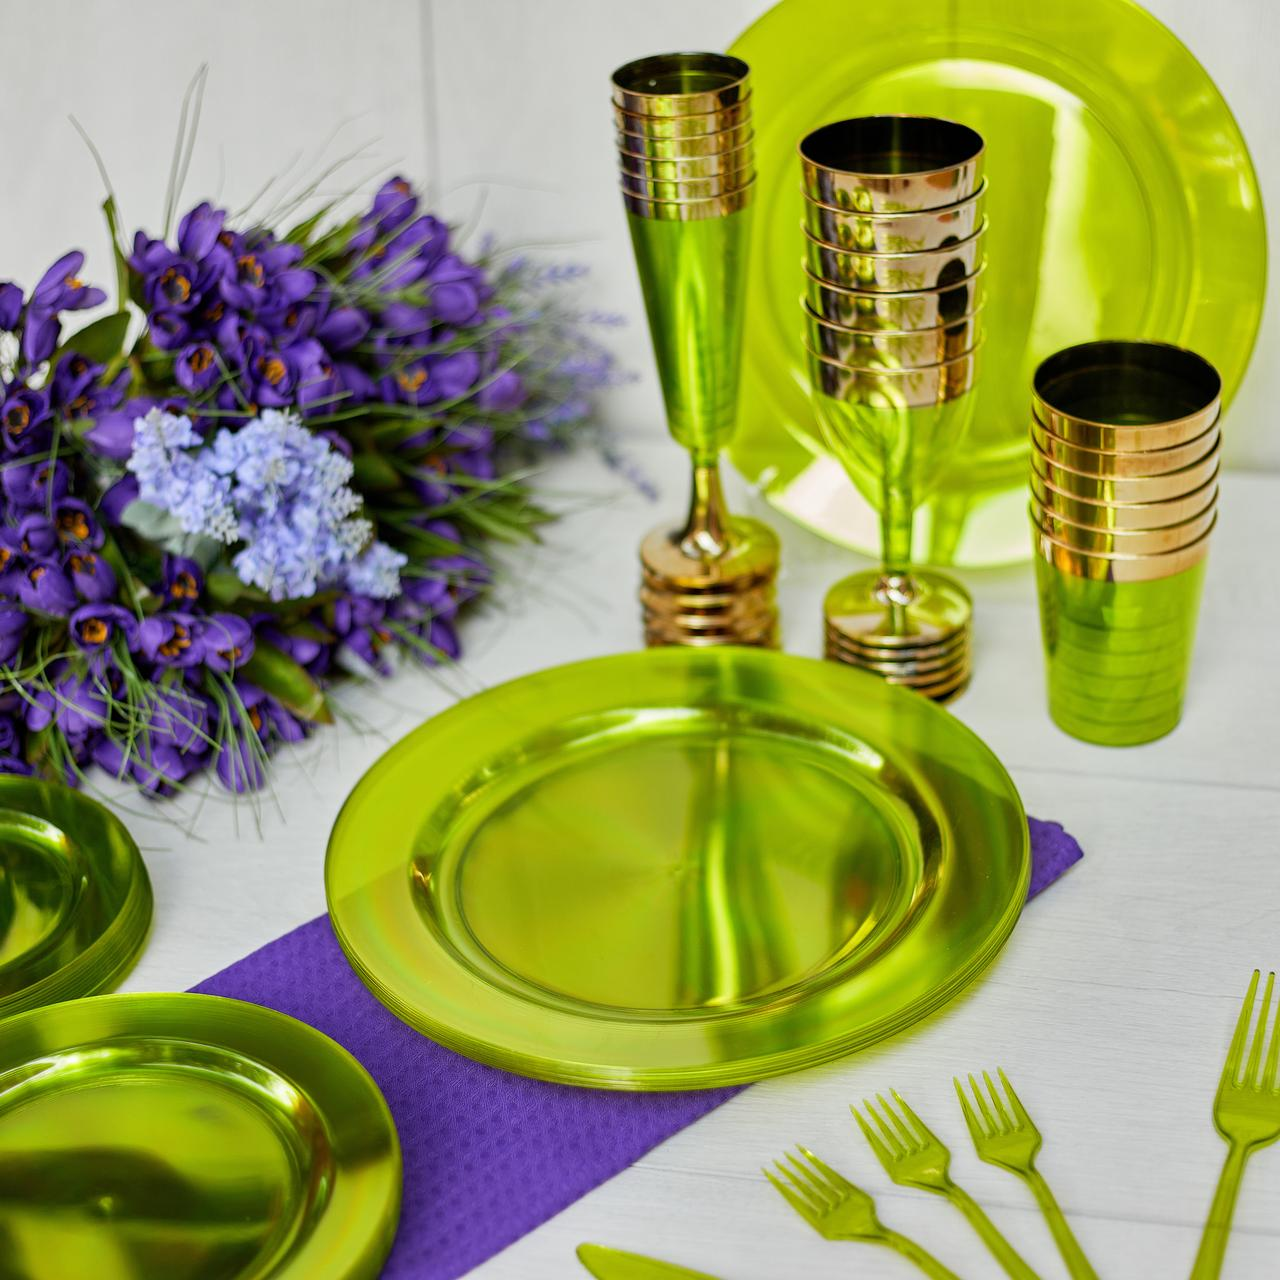 Одноразовая посуда тарелки 6 шт 260 мм  оптом от производителя для ресторанов, кейтеринга, хореки CFP